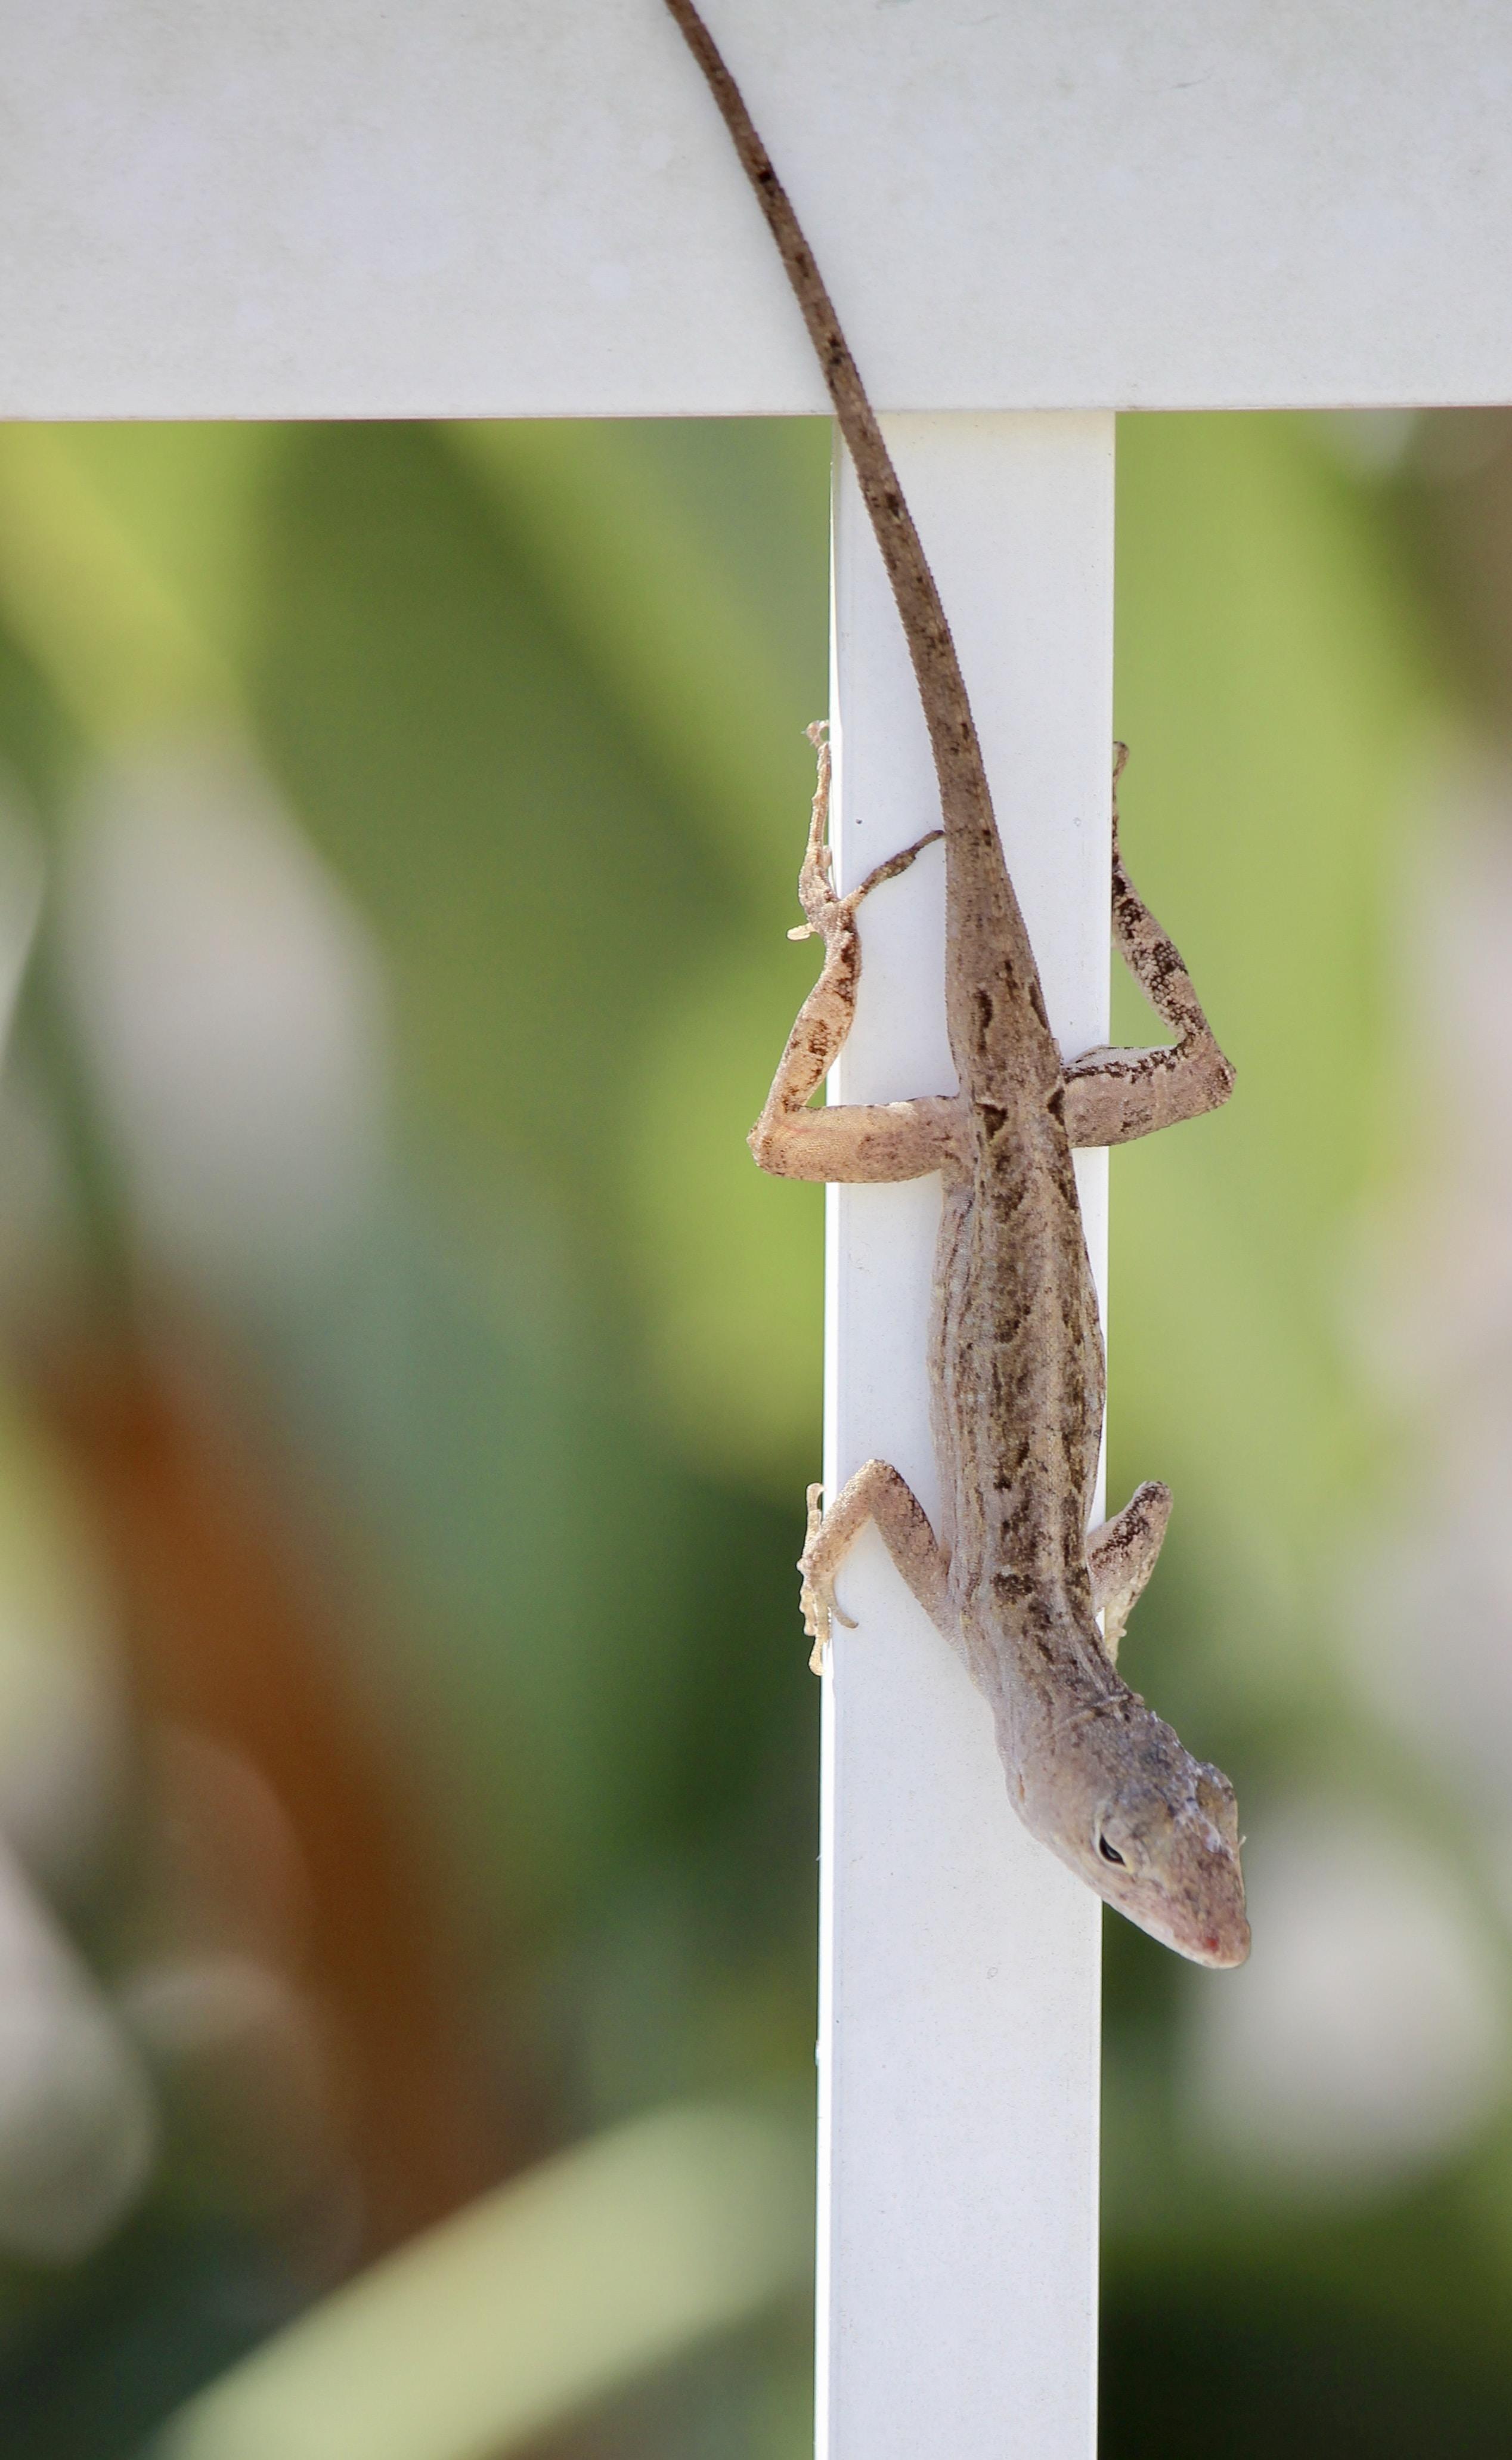 brown lizard in bokeh photography